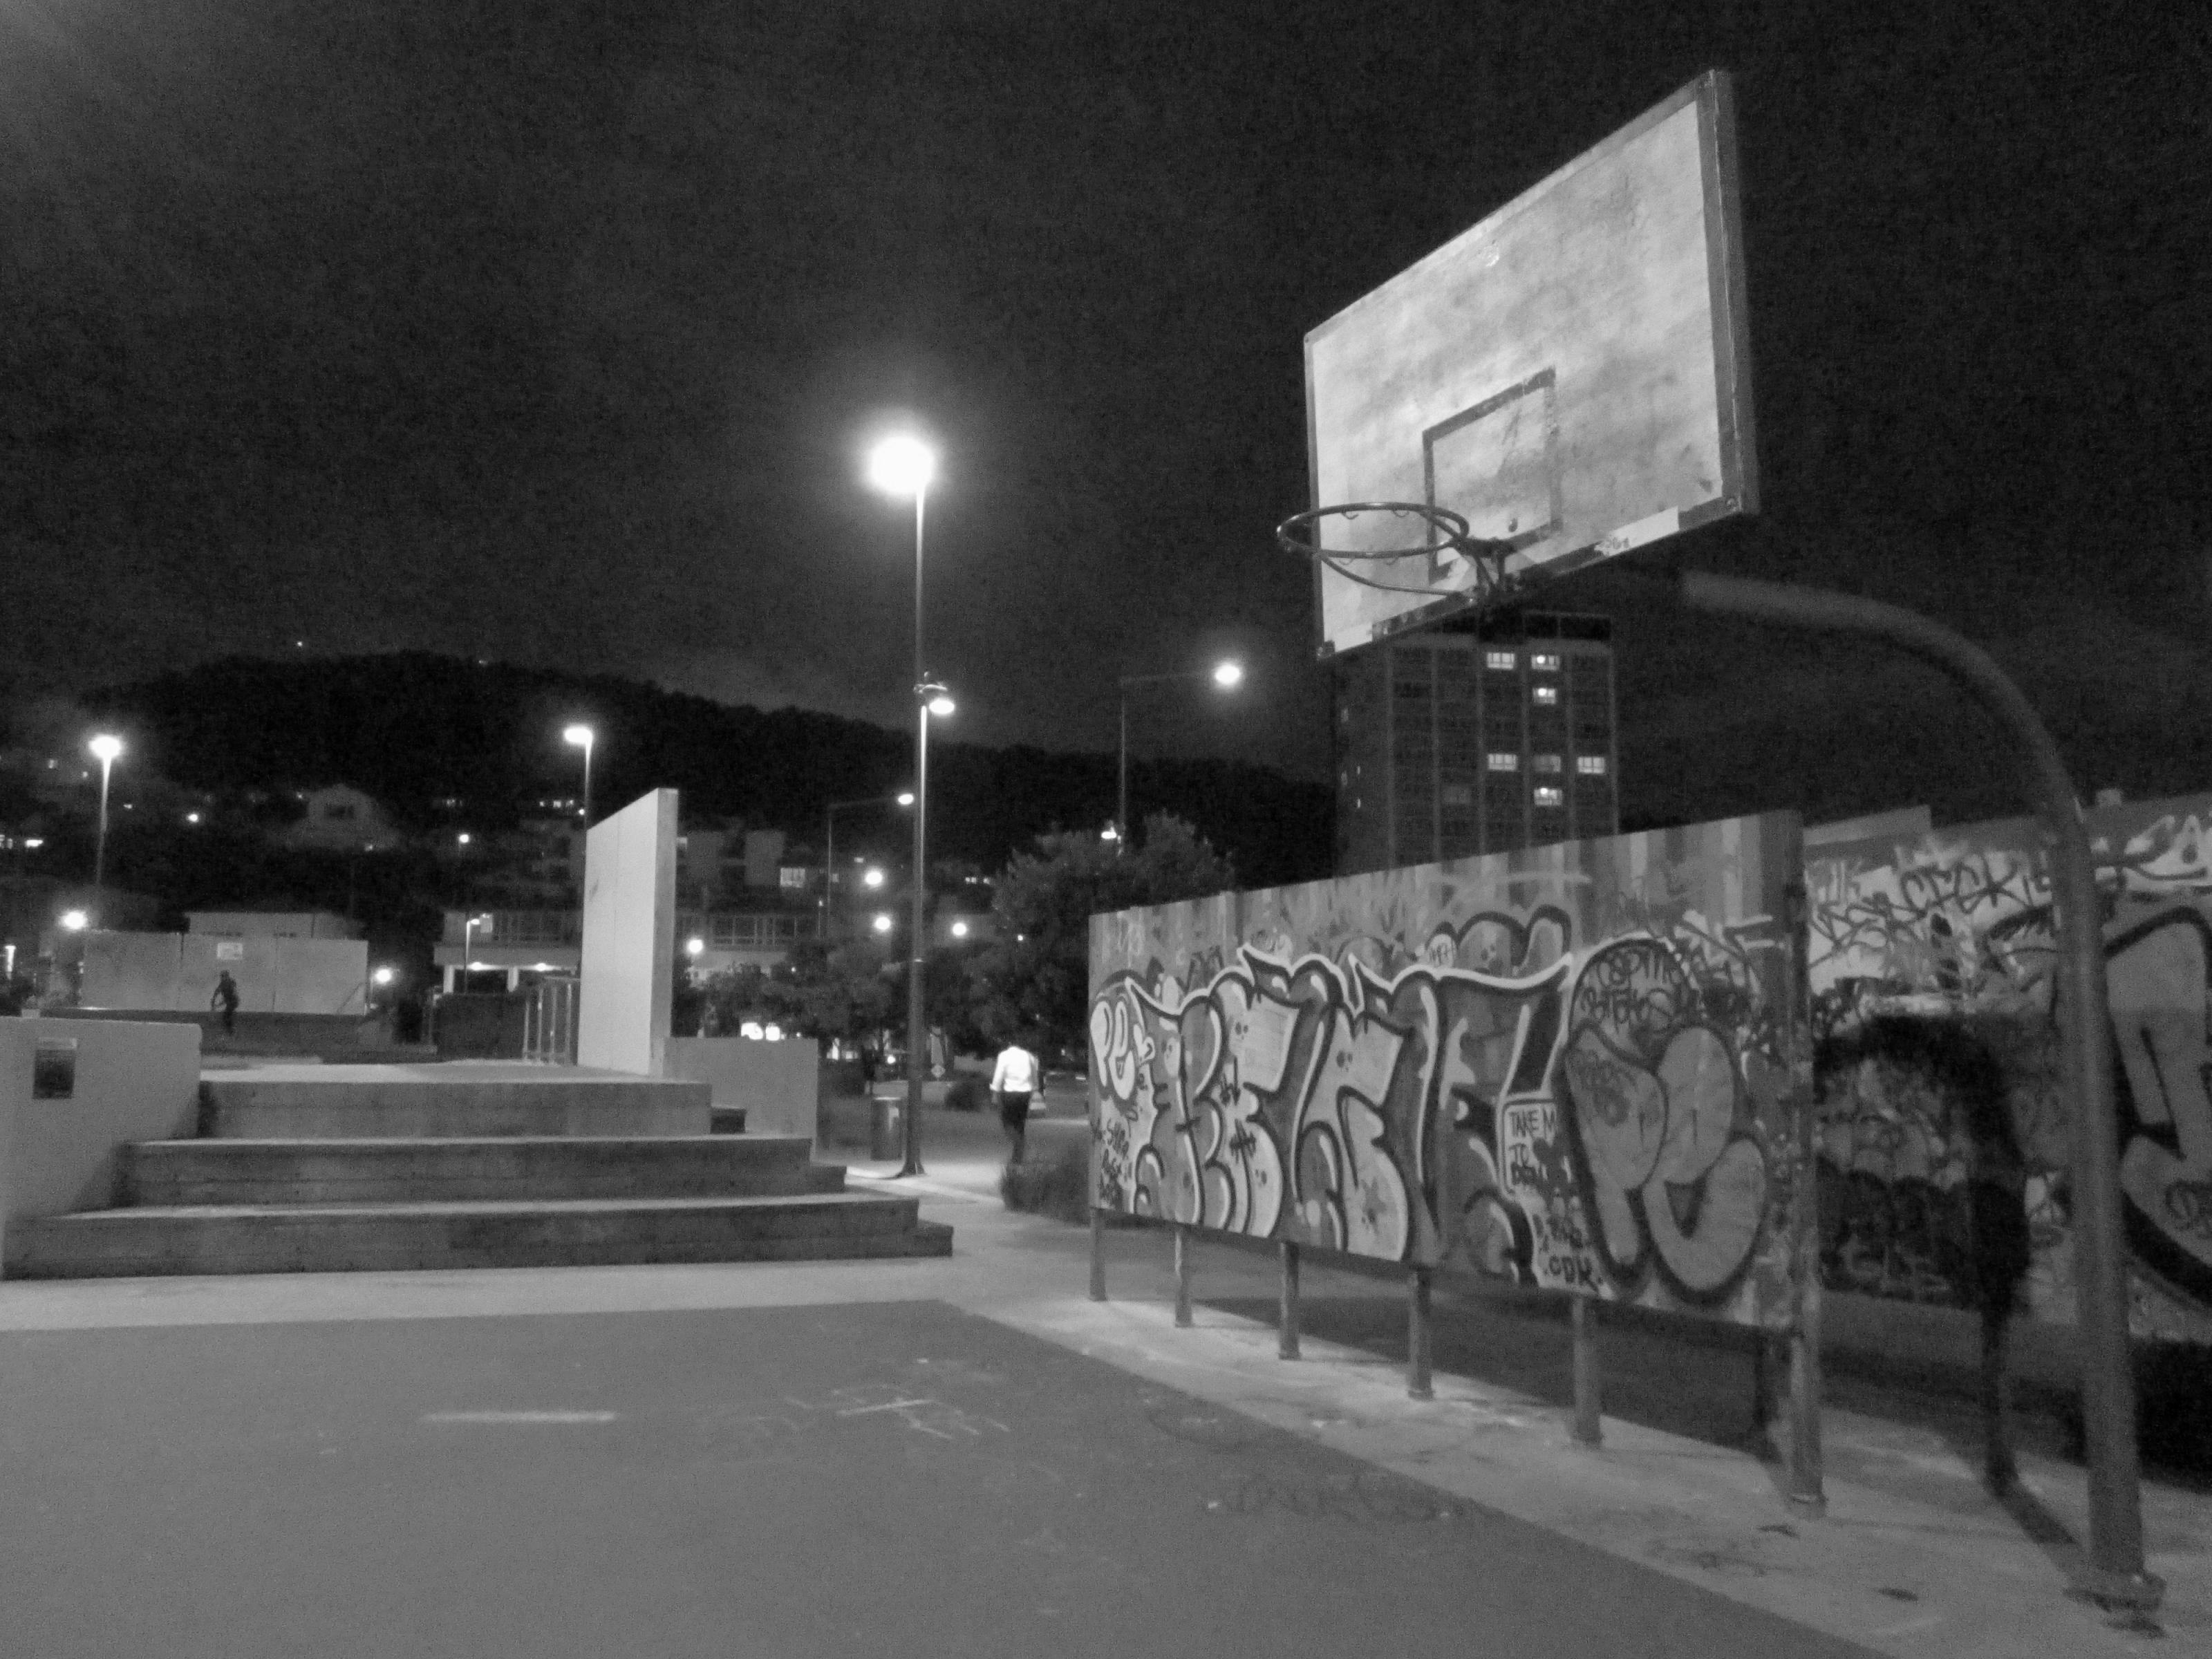 basketball court background for desktop. - media file | pixelstalk